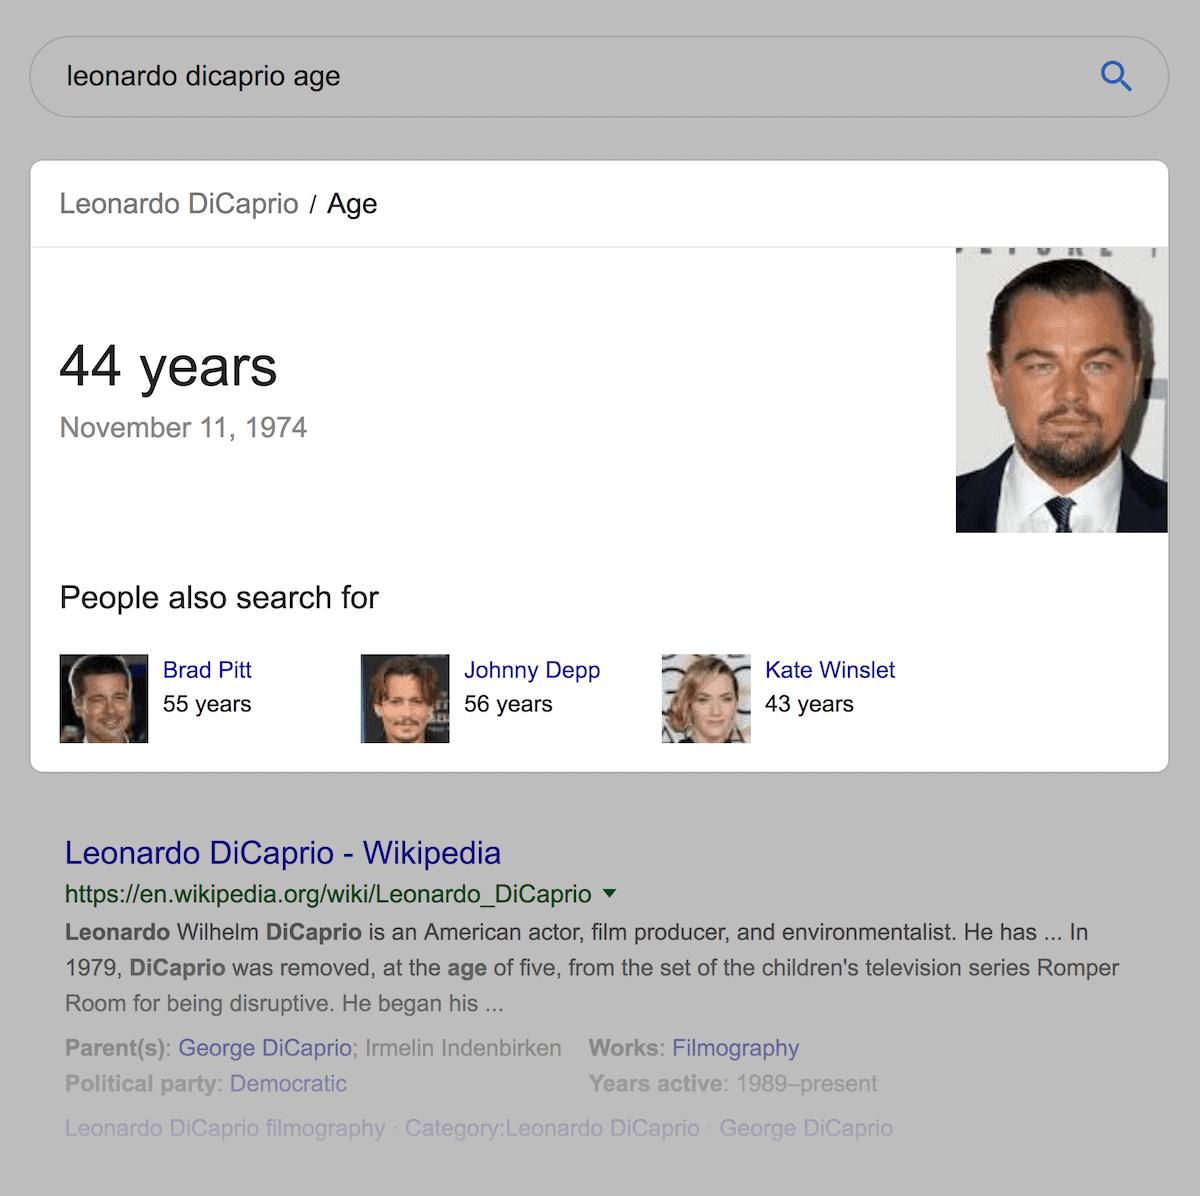 Leonardo DiCaprio age – Google results